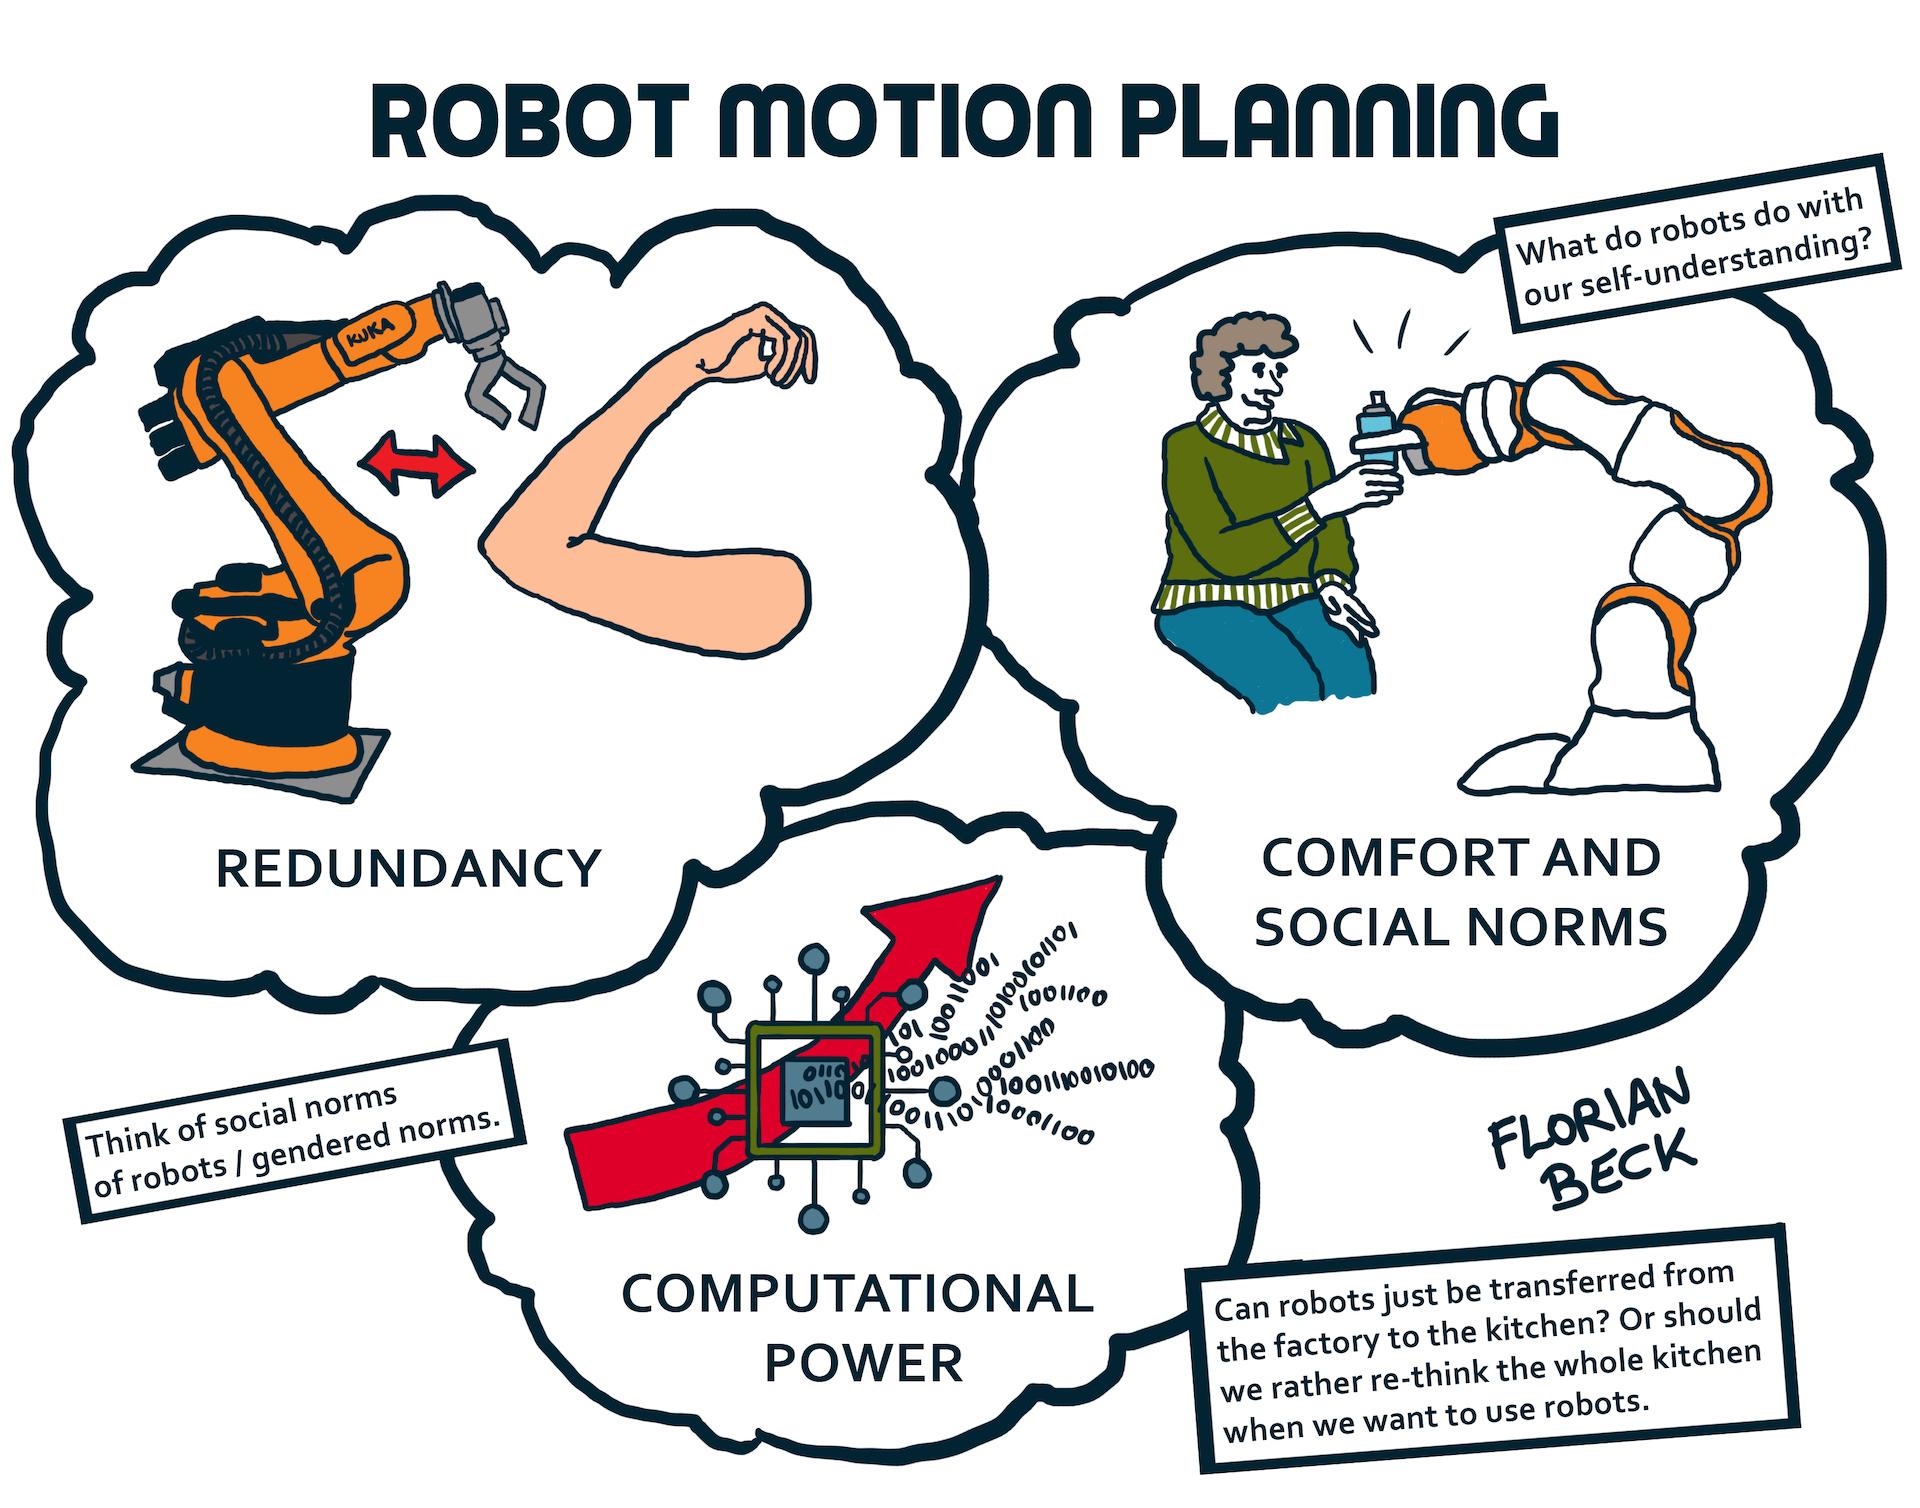 BECKrobotmotionplanning v2